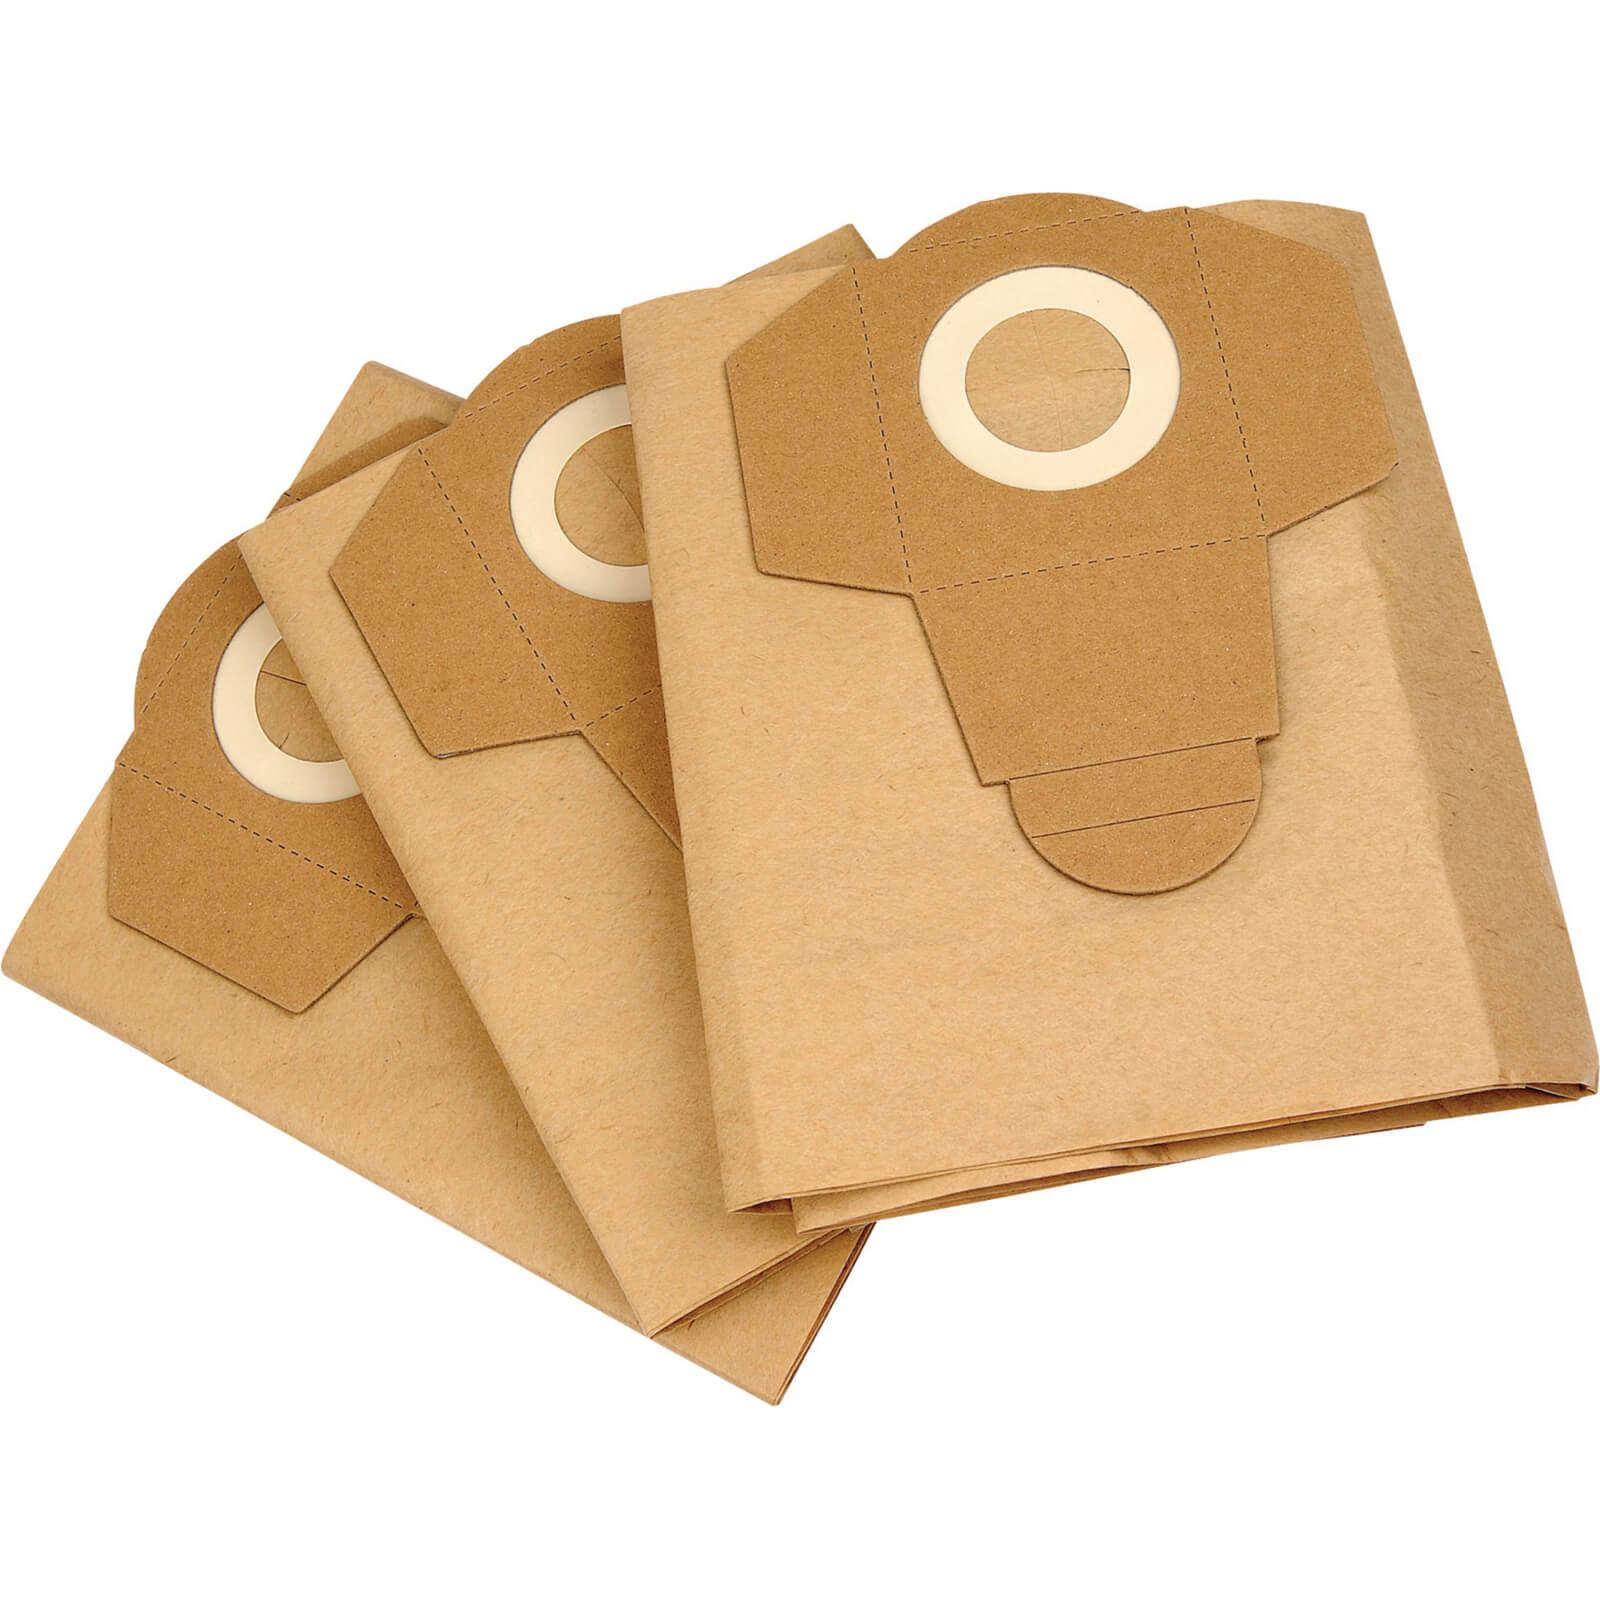 Draper Dust Bags for 13779 Vacuum Cleaner